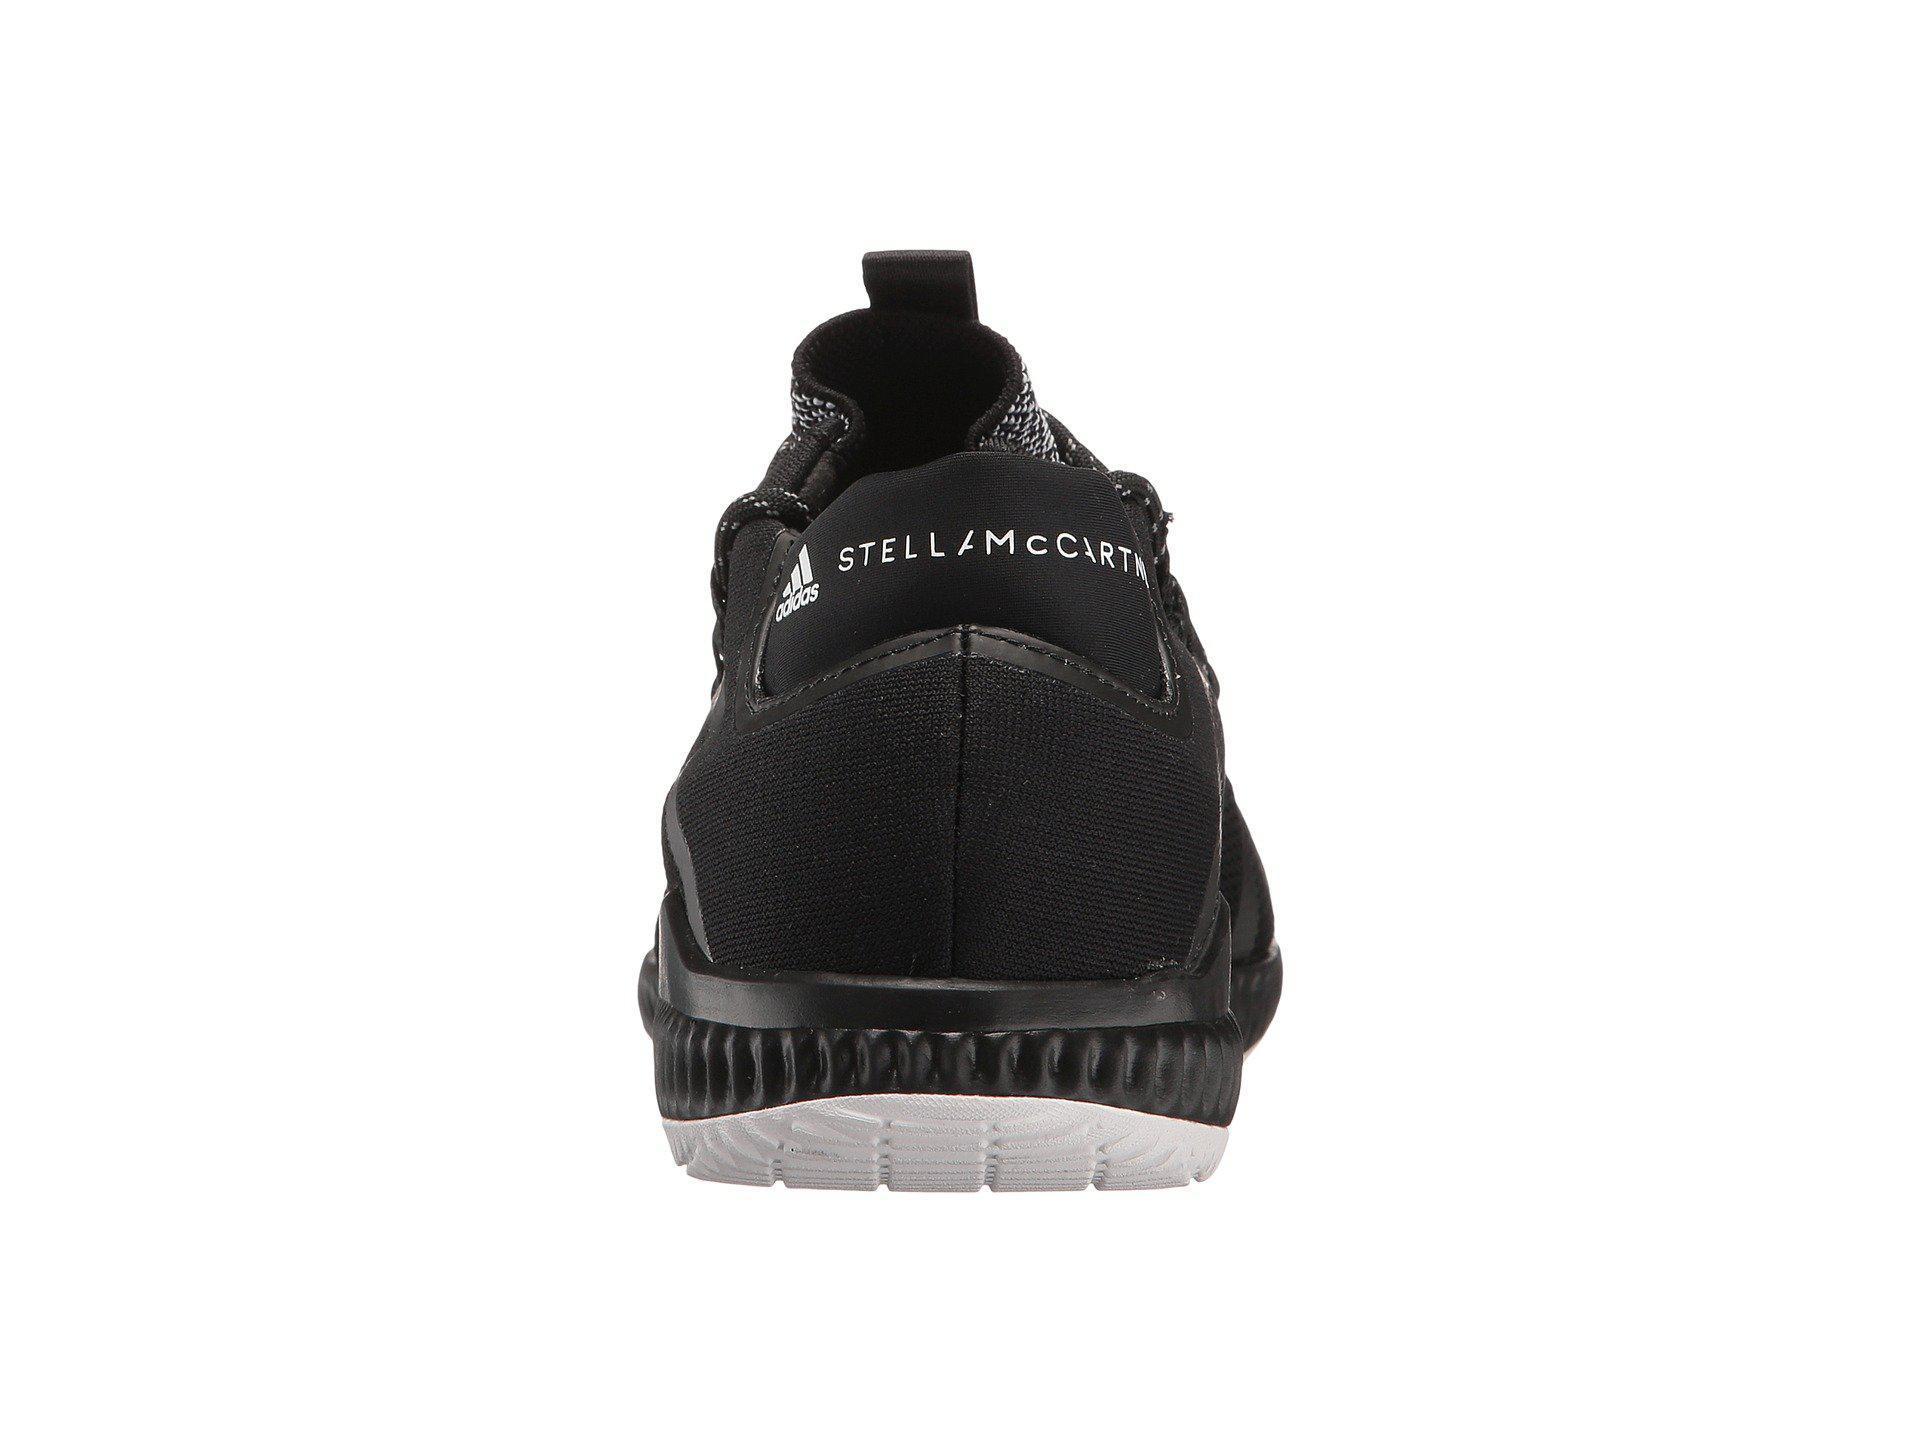 adidas by Stella McCartney adidas by Stella McCartney Ultraboost X (Core BlackCore BlackFootwear White) Women's Shoes from Zappos | ShapeShop